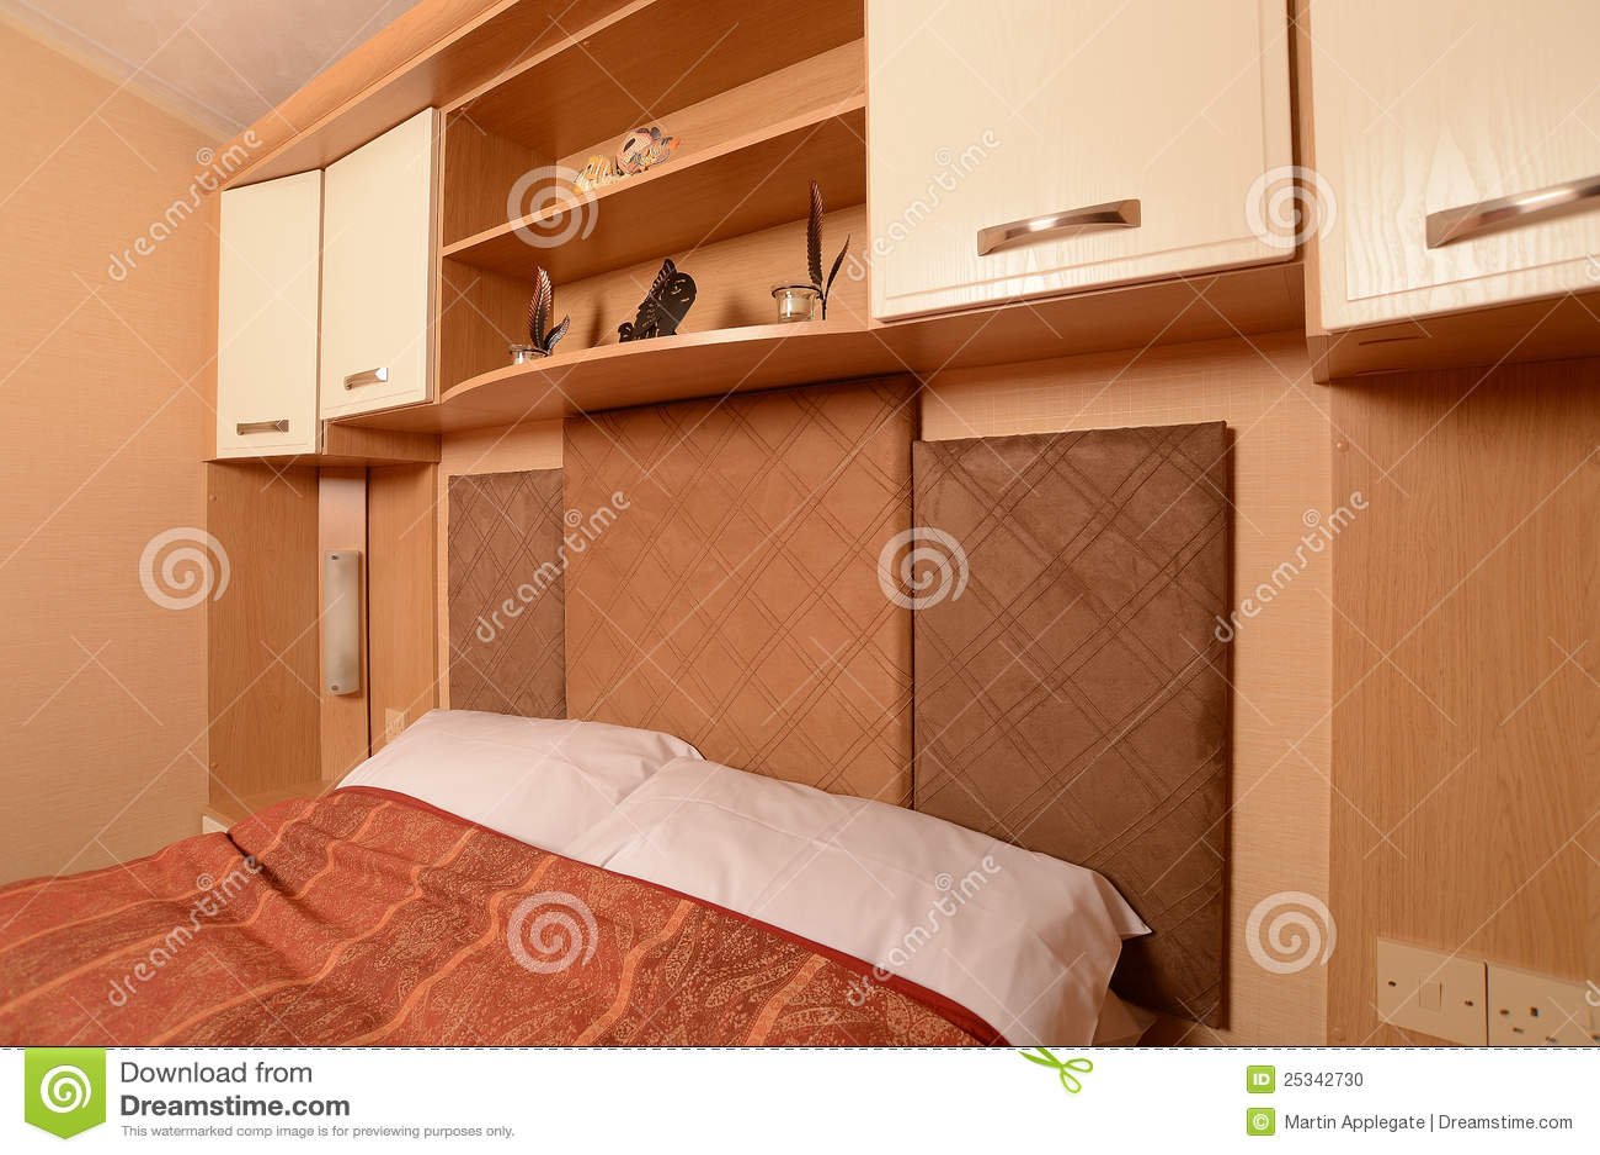 Chambre coucher de caravane r sidentielle photo stock for Caravane chambre